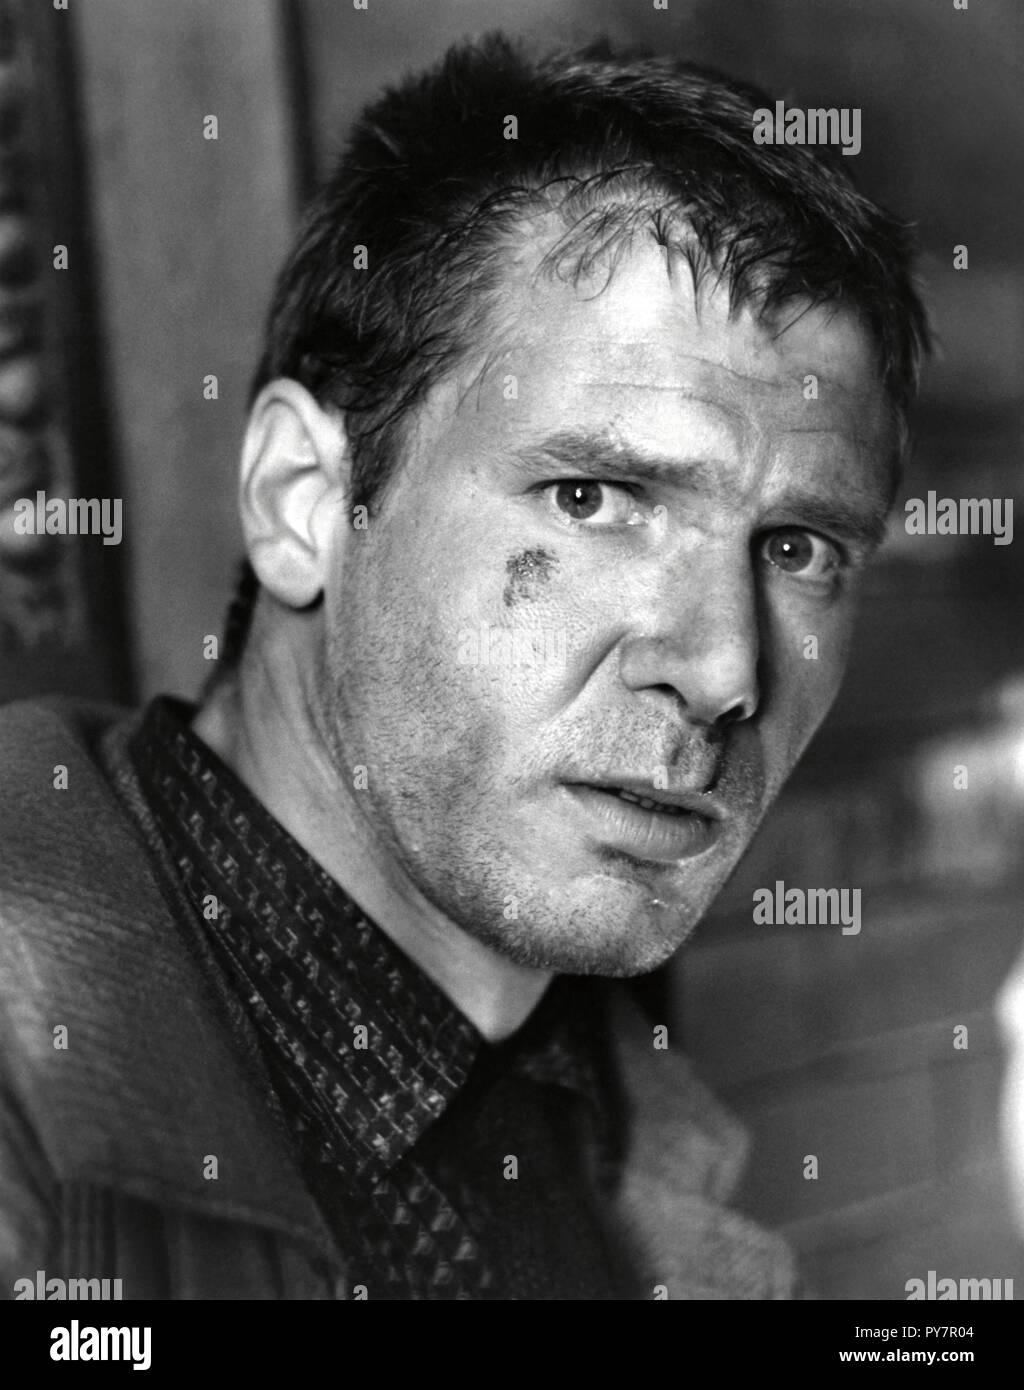 Original film title: BLADE RUNNER. English title: BLADE RUNNER. Year: 1982. Director: RIDLEY SCOTT. Stars: HARRISON FORD. Credit: LADD COMPANY/WARNER BROS / Album - Stock Image